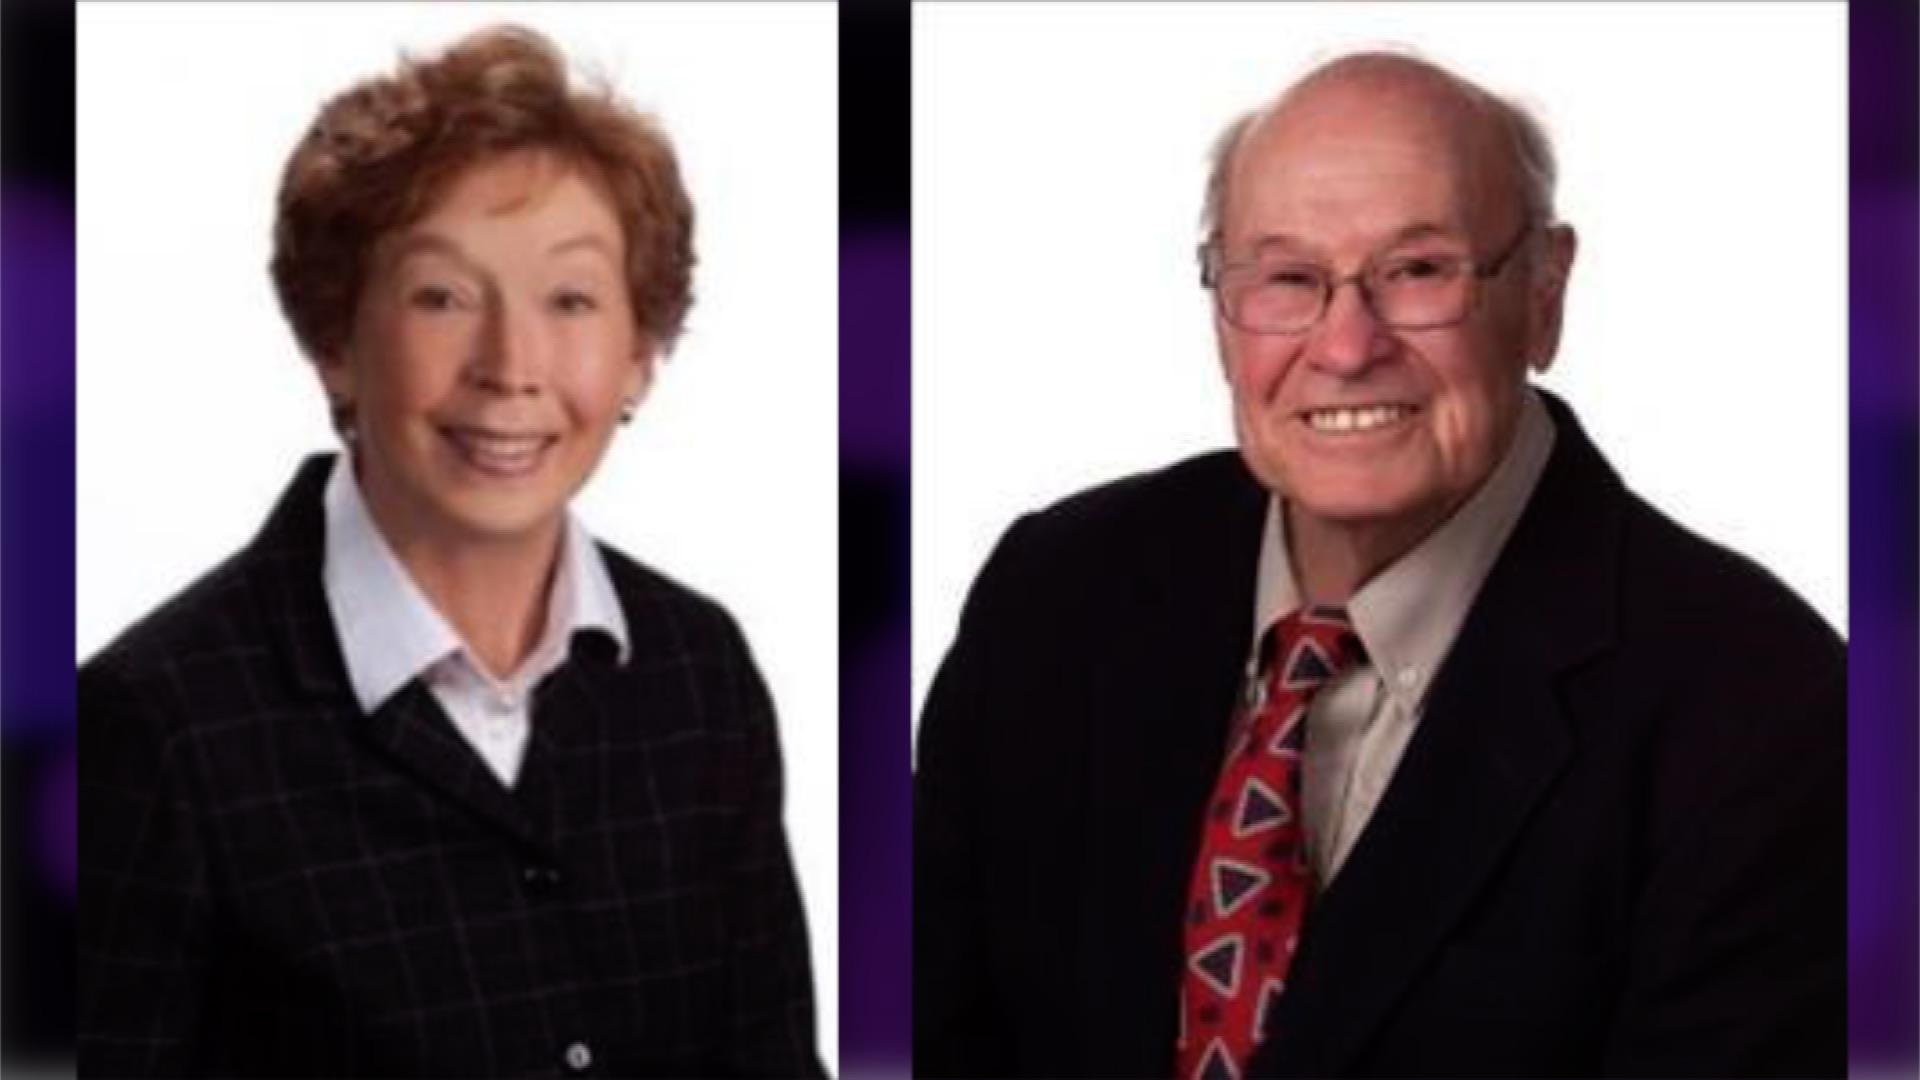 Nancy Hinchliffe & Bob Hinchliffe